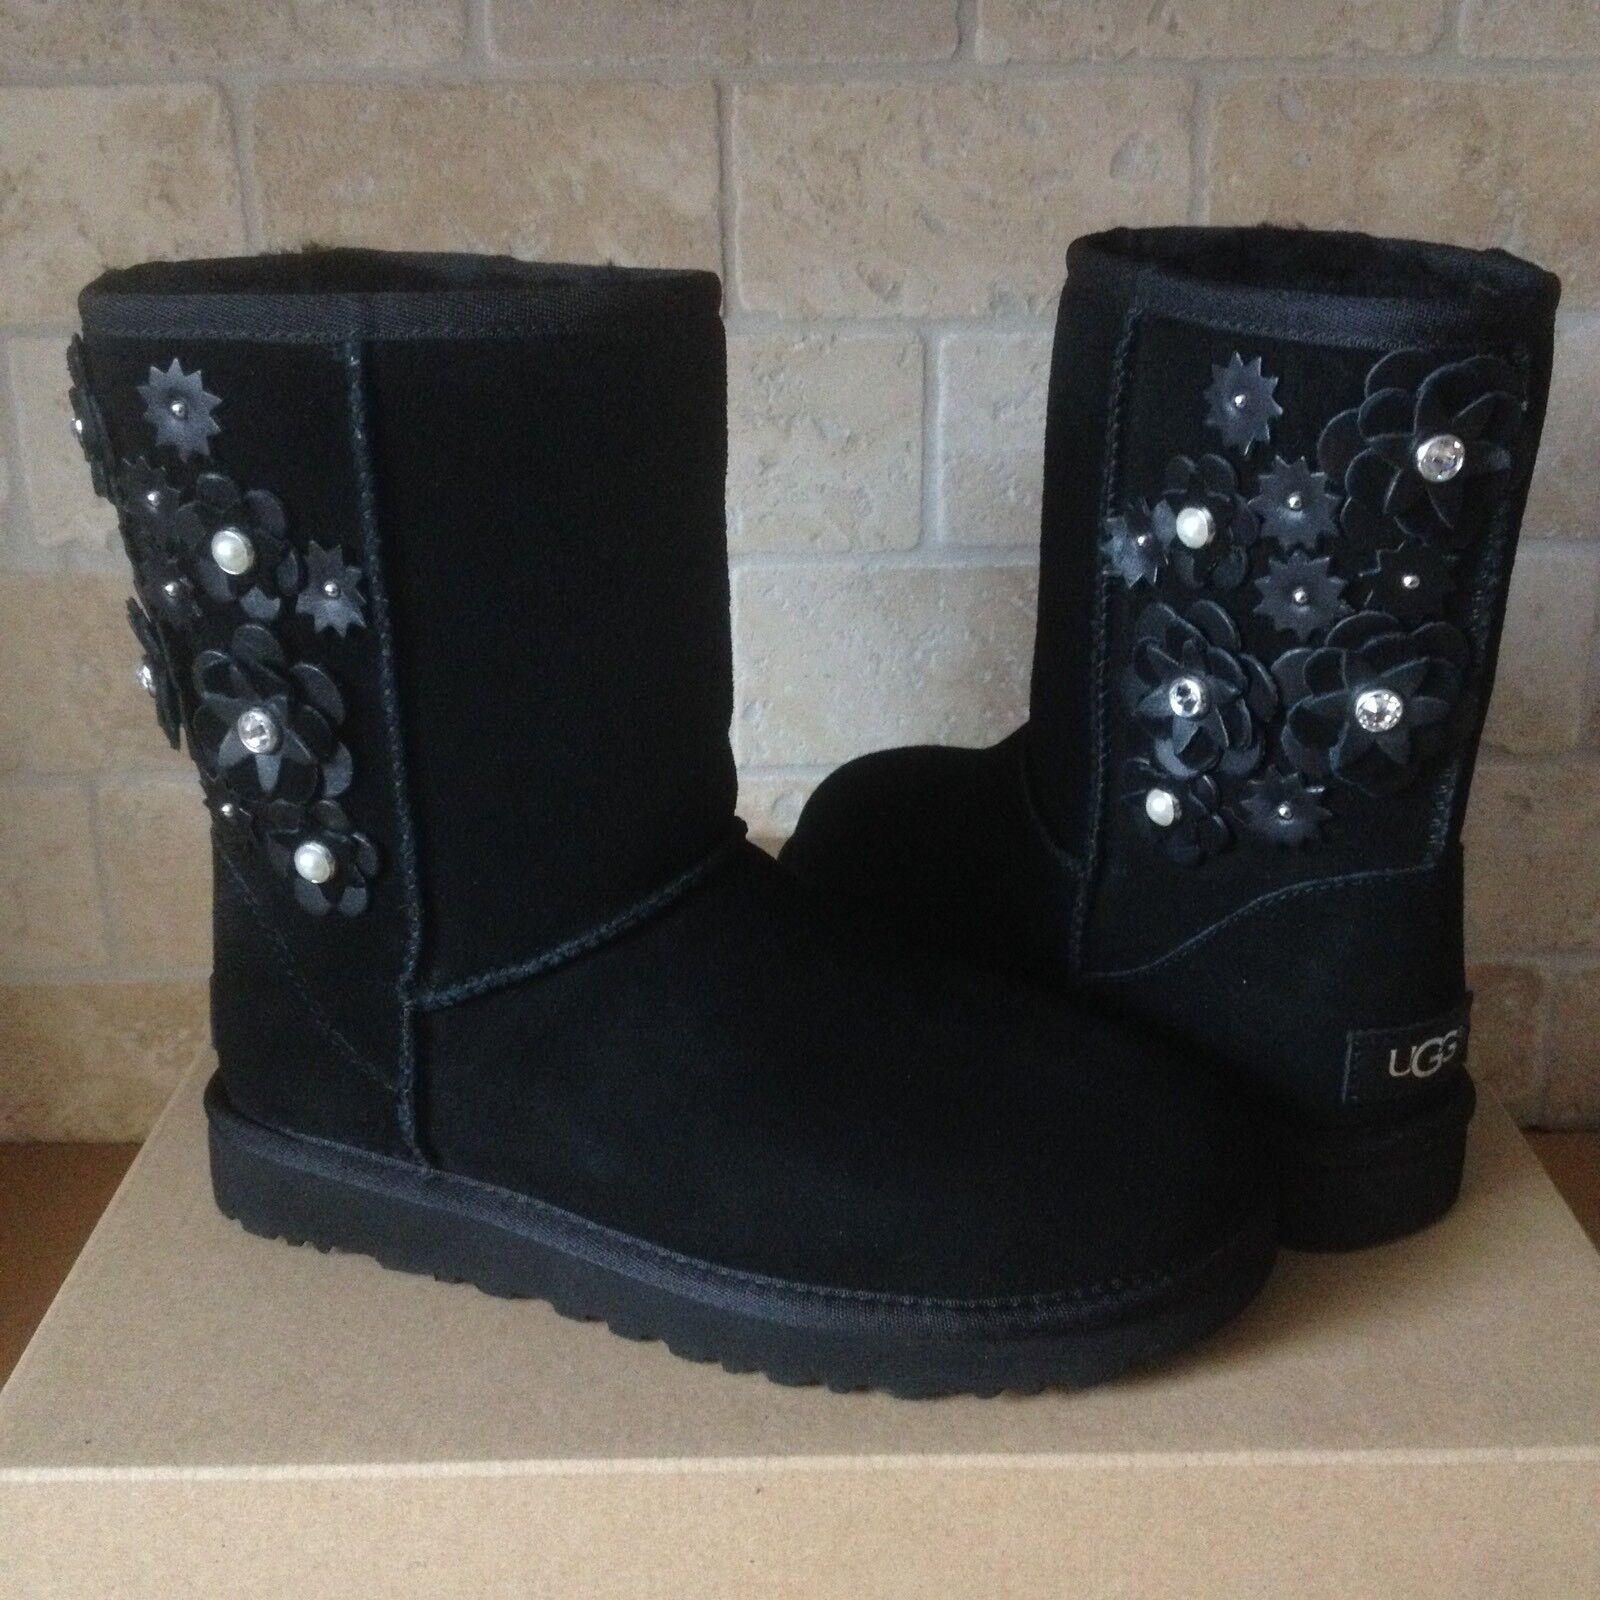 9f510d13ecb UGG Classic Short Petal Black Bling Suede Sheepskin BOOTS Size 6 US